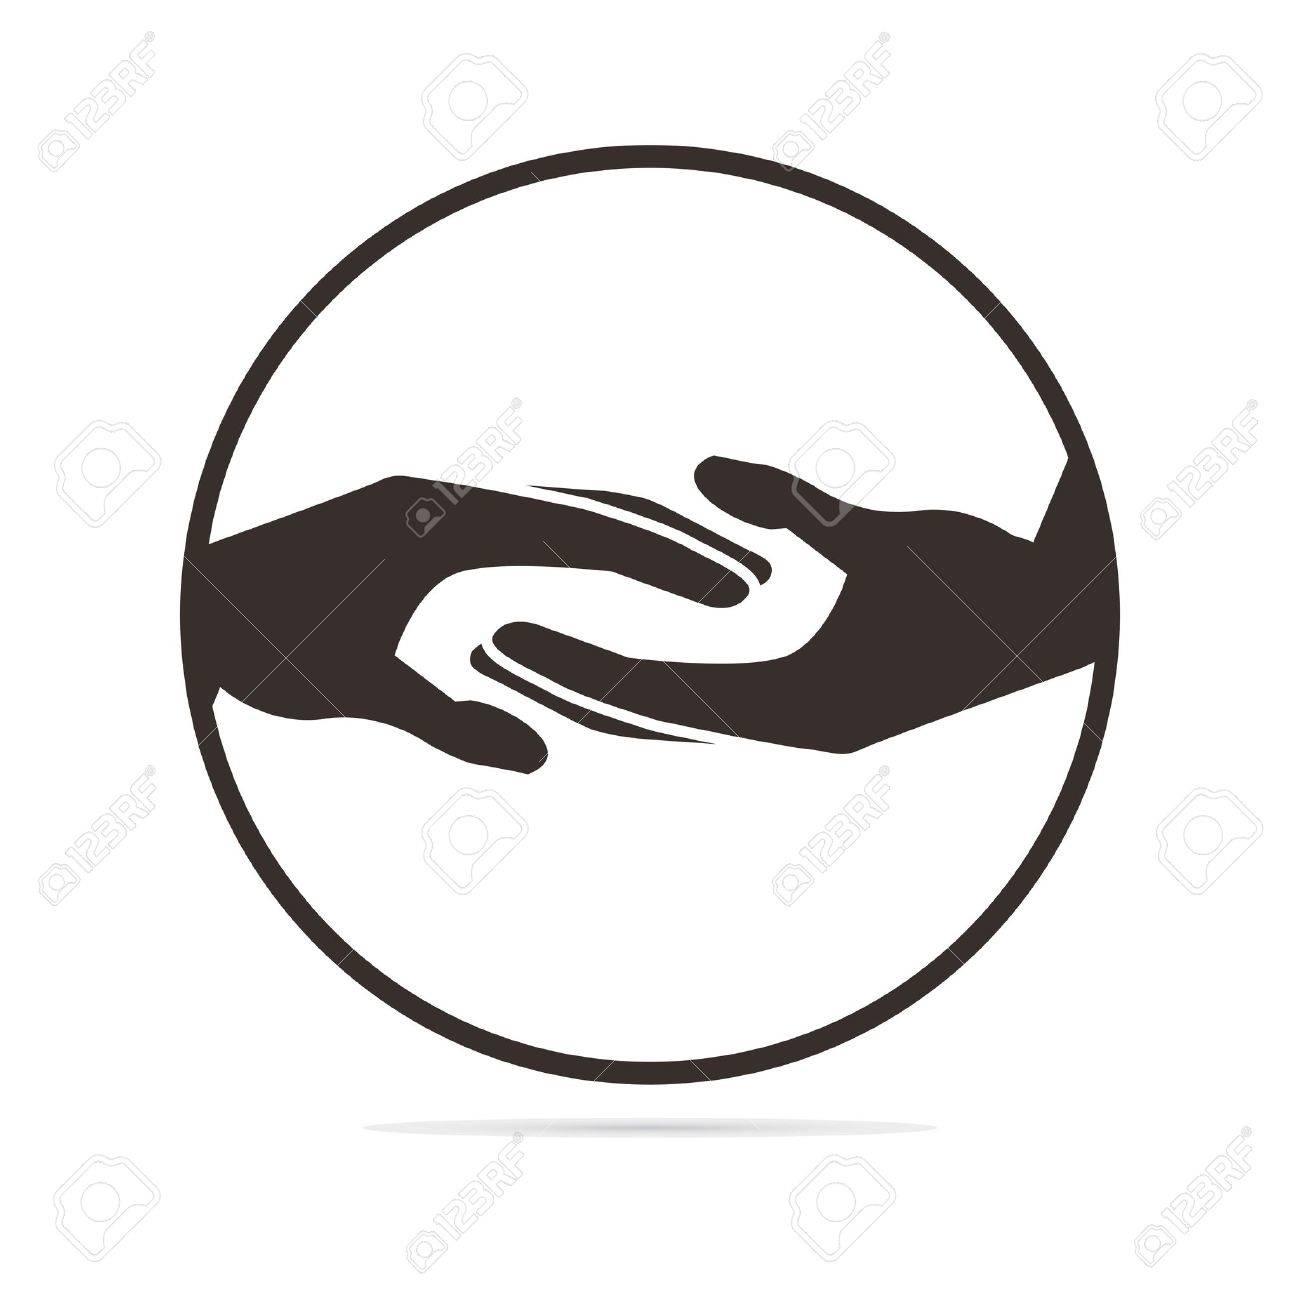 helping hands illustration - 38415743